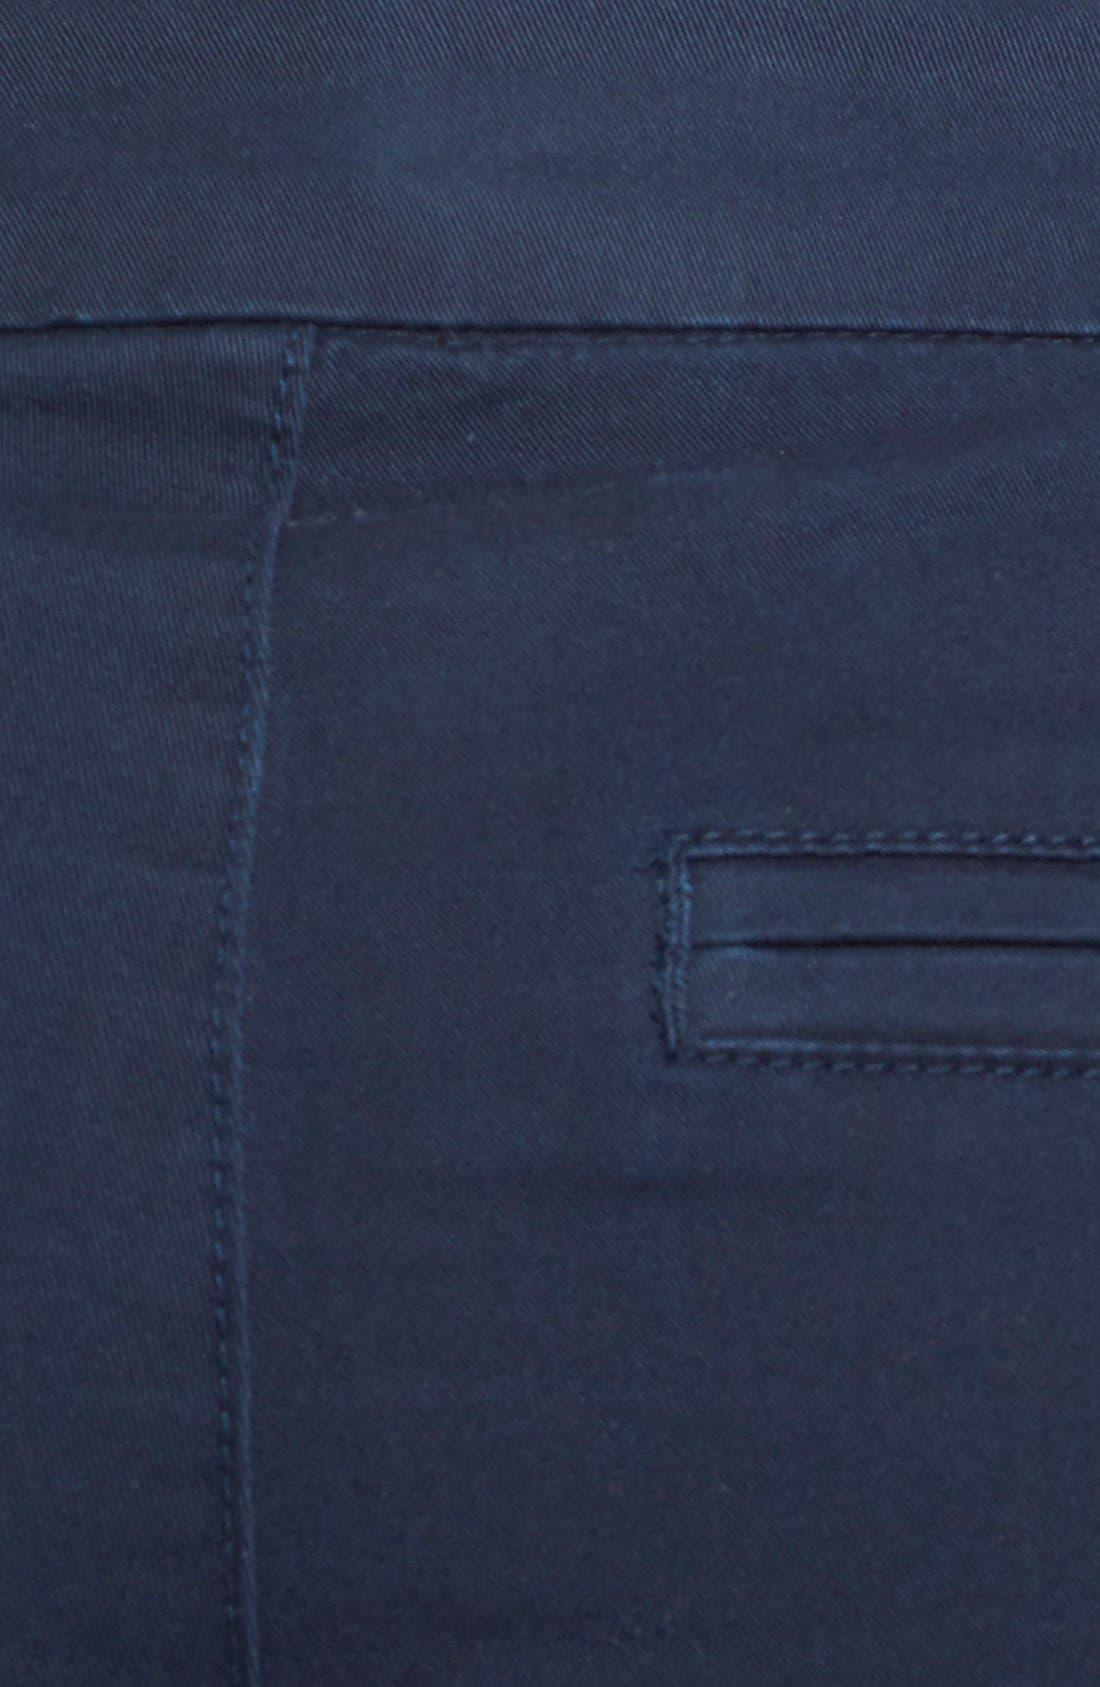 'Ainsley' Slim Bermuda Shorts,                             Alternate thumbnail 19, color,